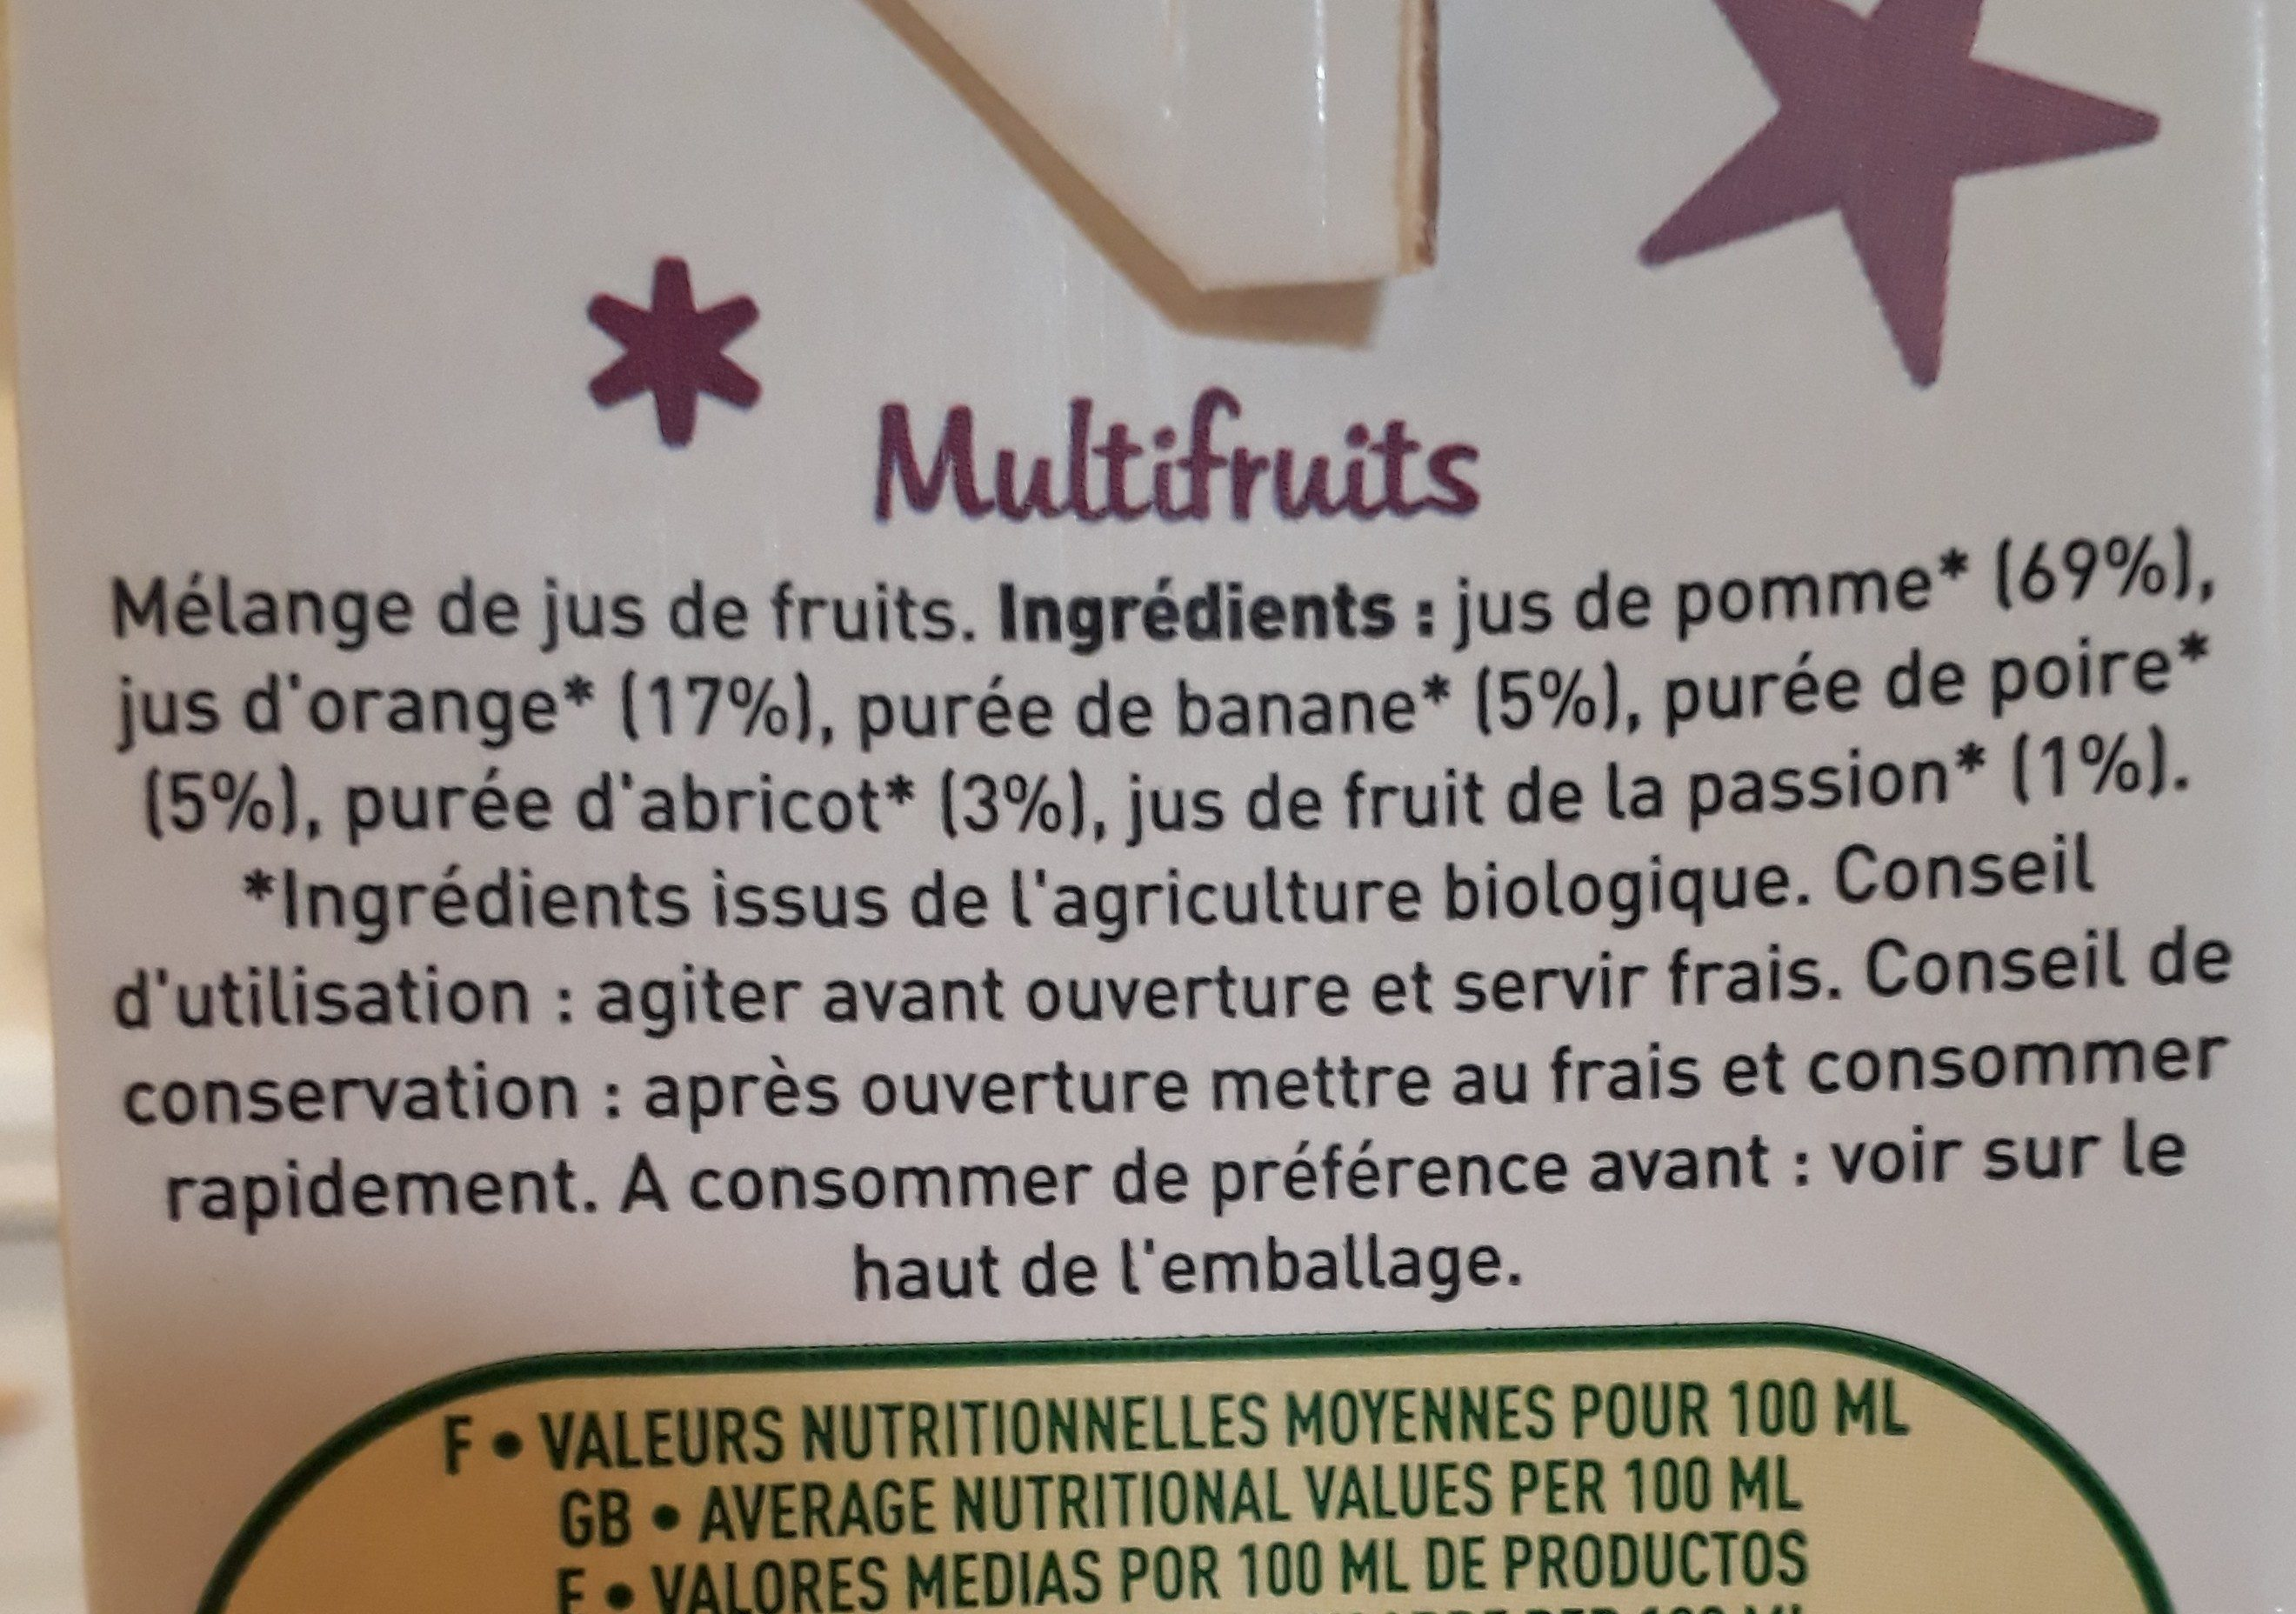 Cocktail multifruits - Ingrédients